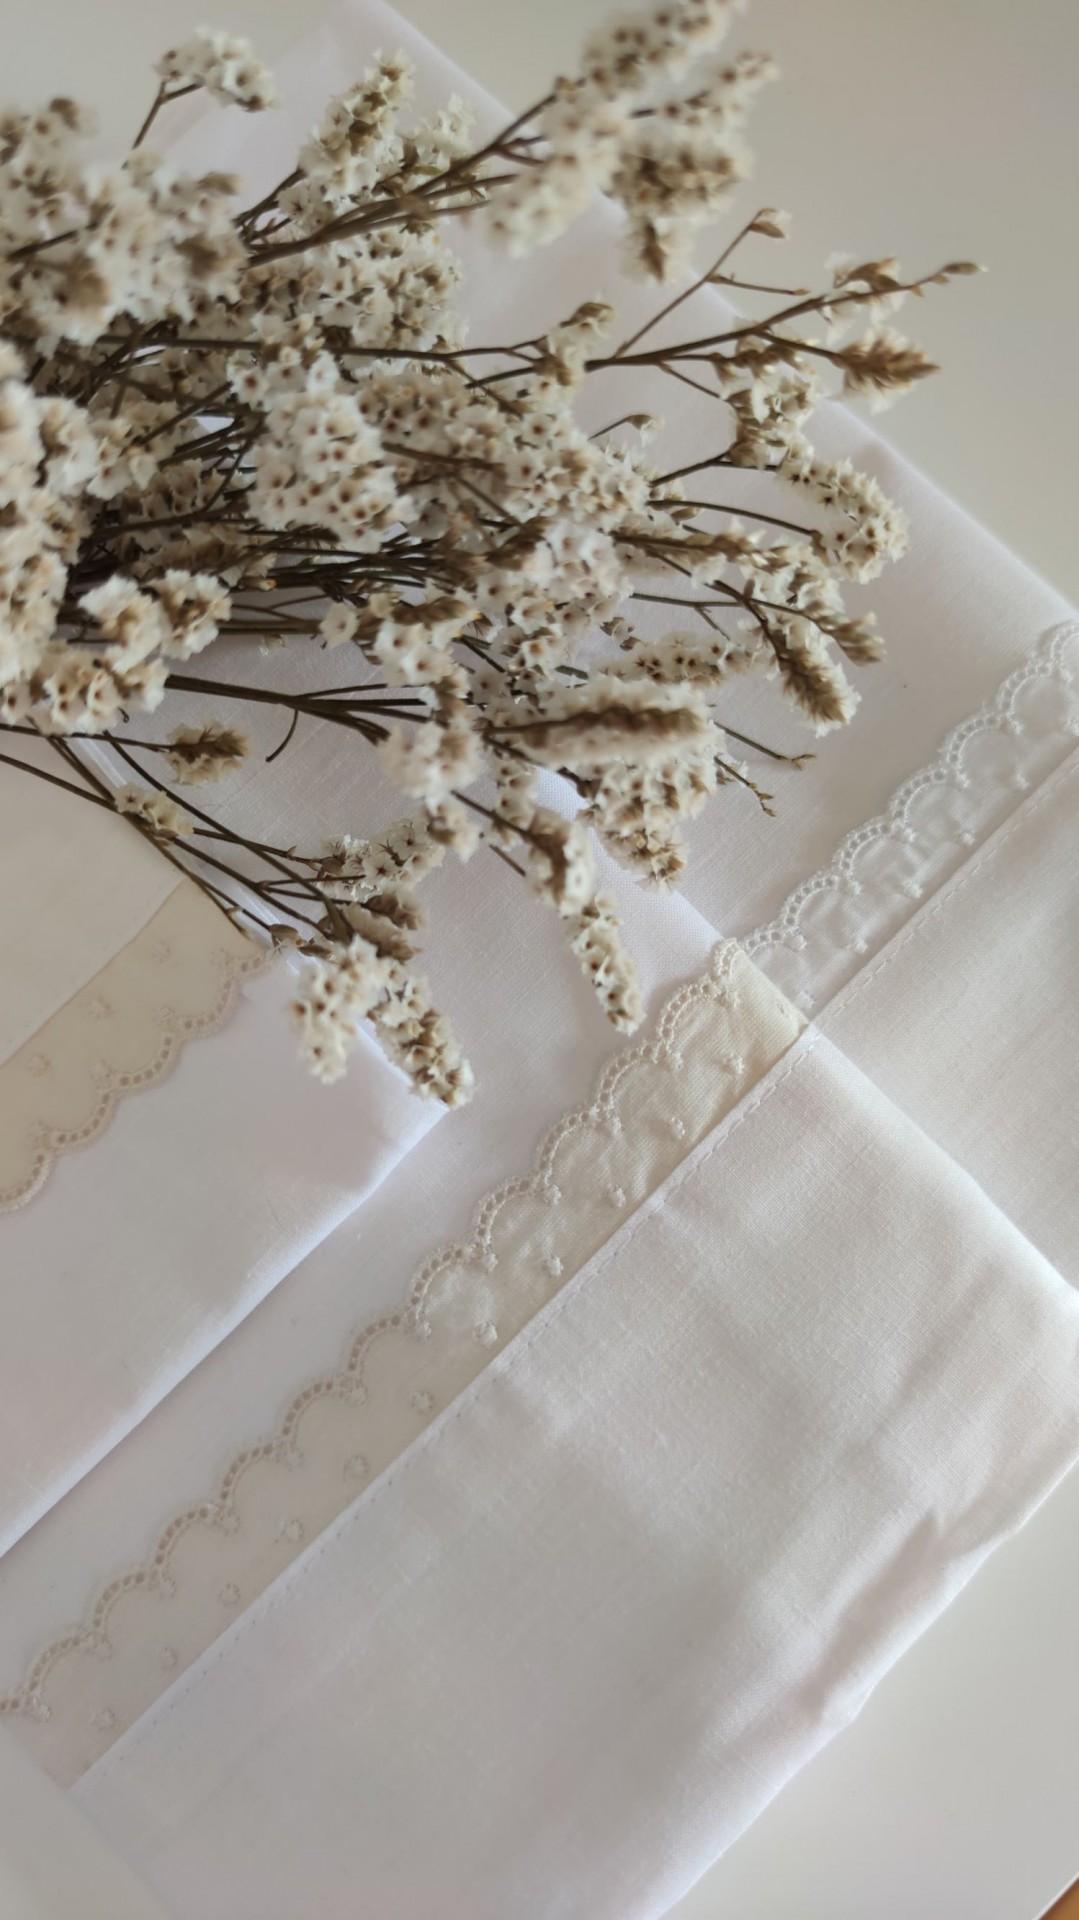 Lençois cama de grades bordado